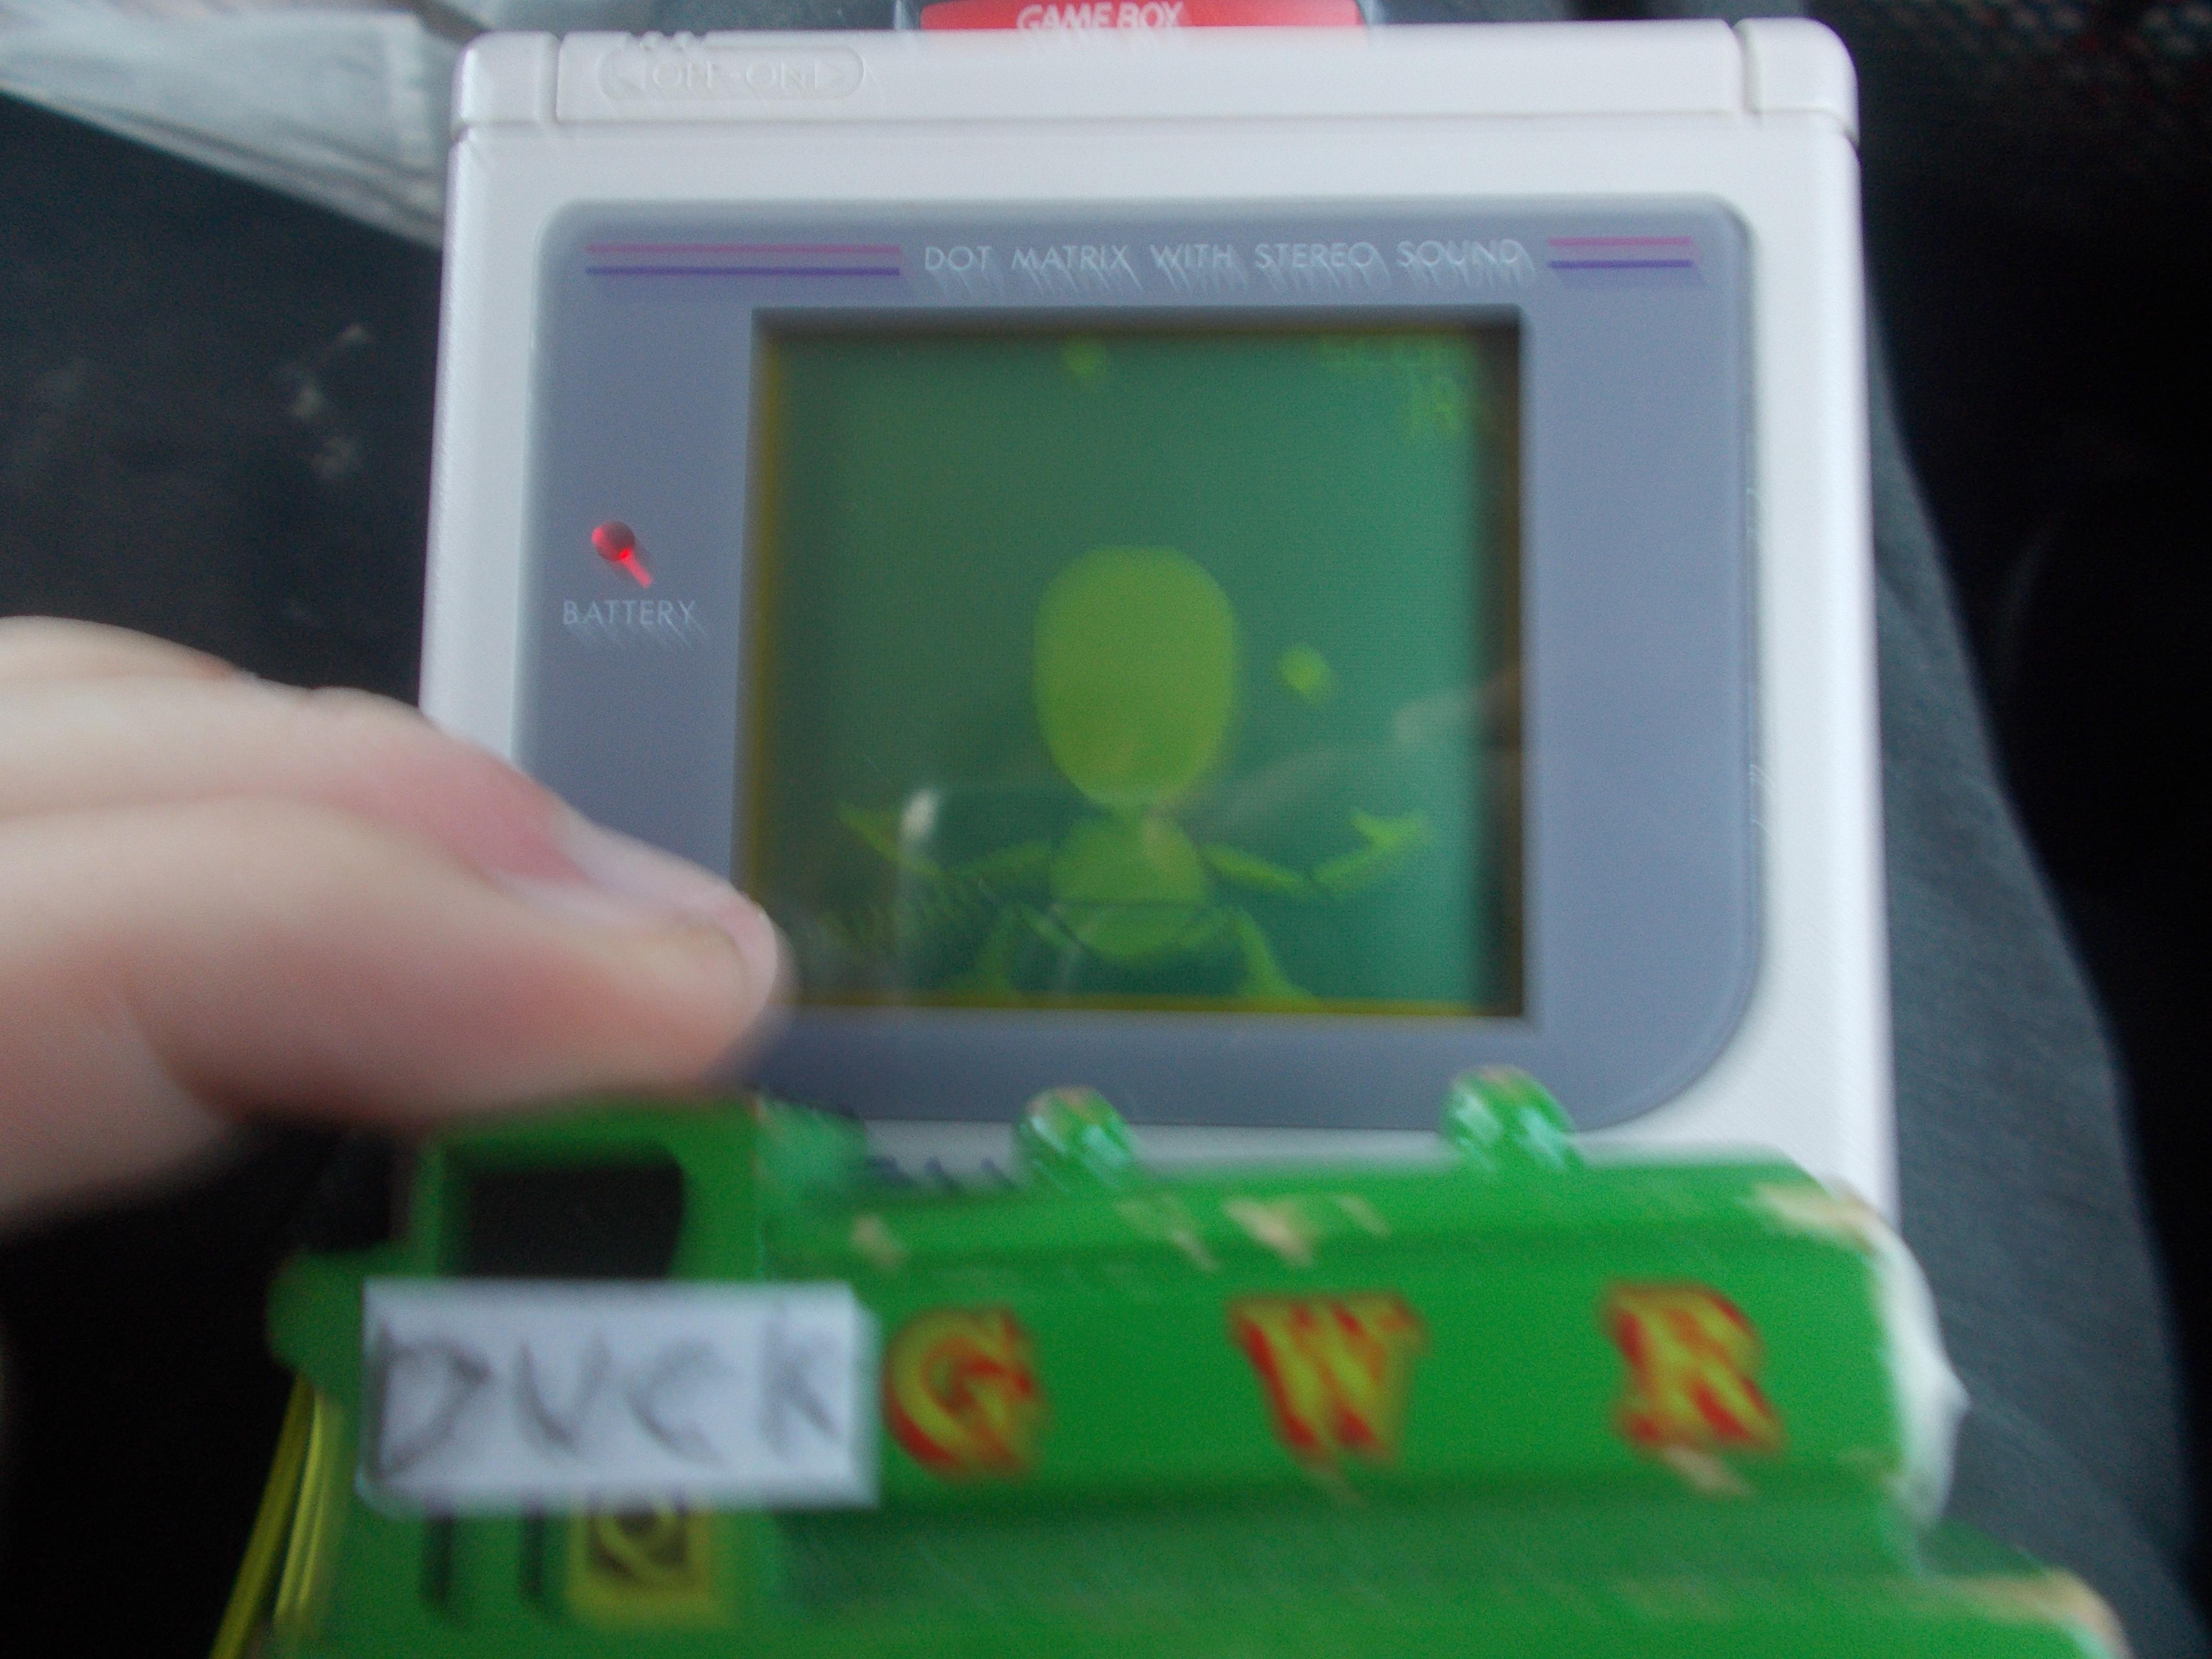 Game Boy Camera: Ball 194 points